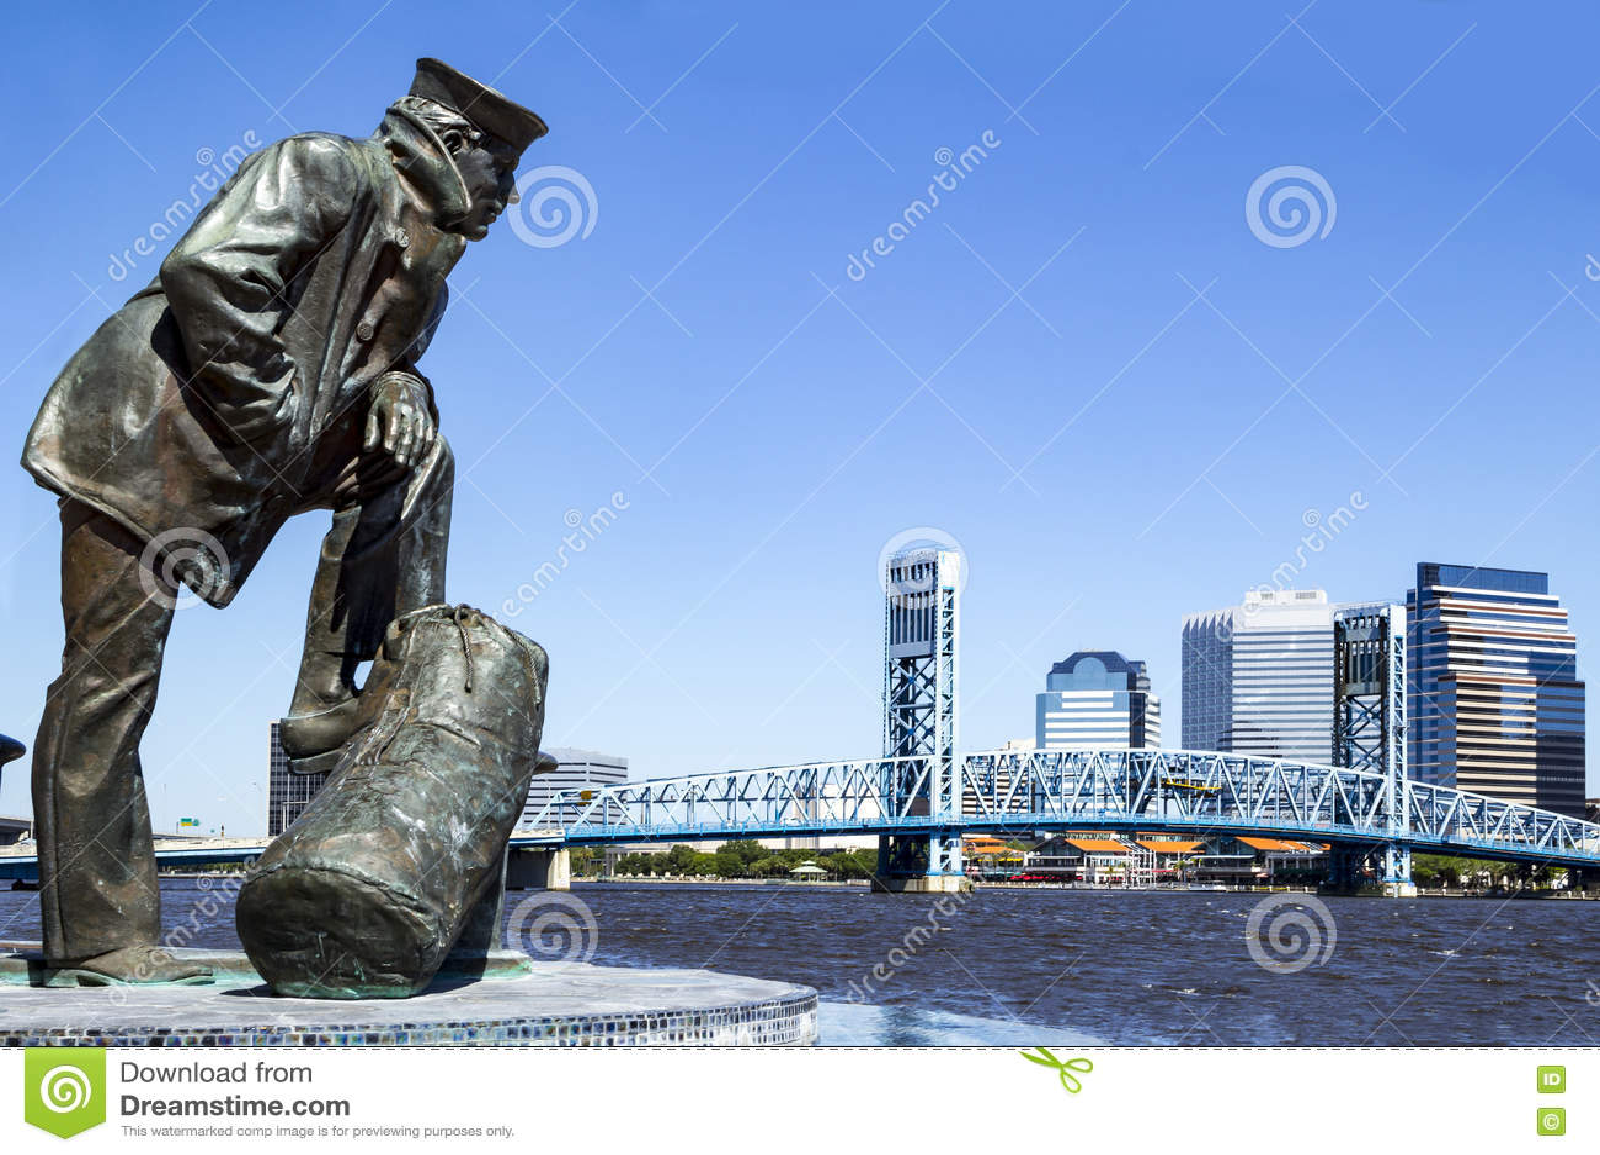 Jacksonville, Florida skyline and sailor sculpture